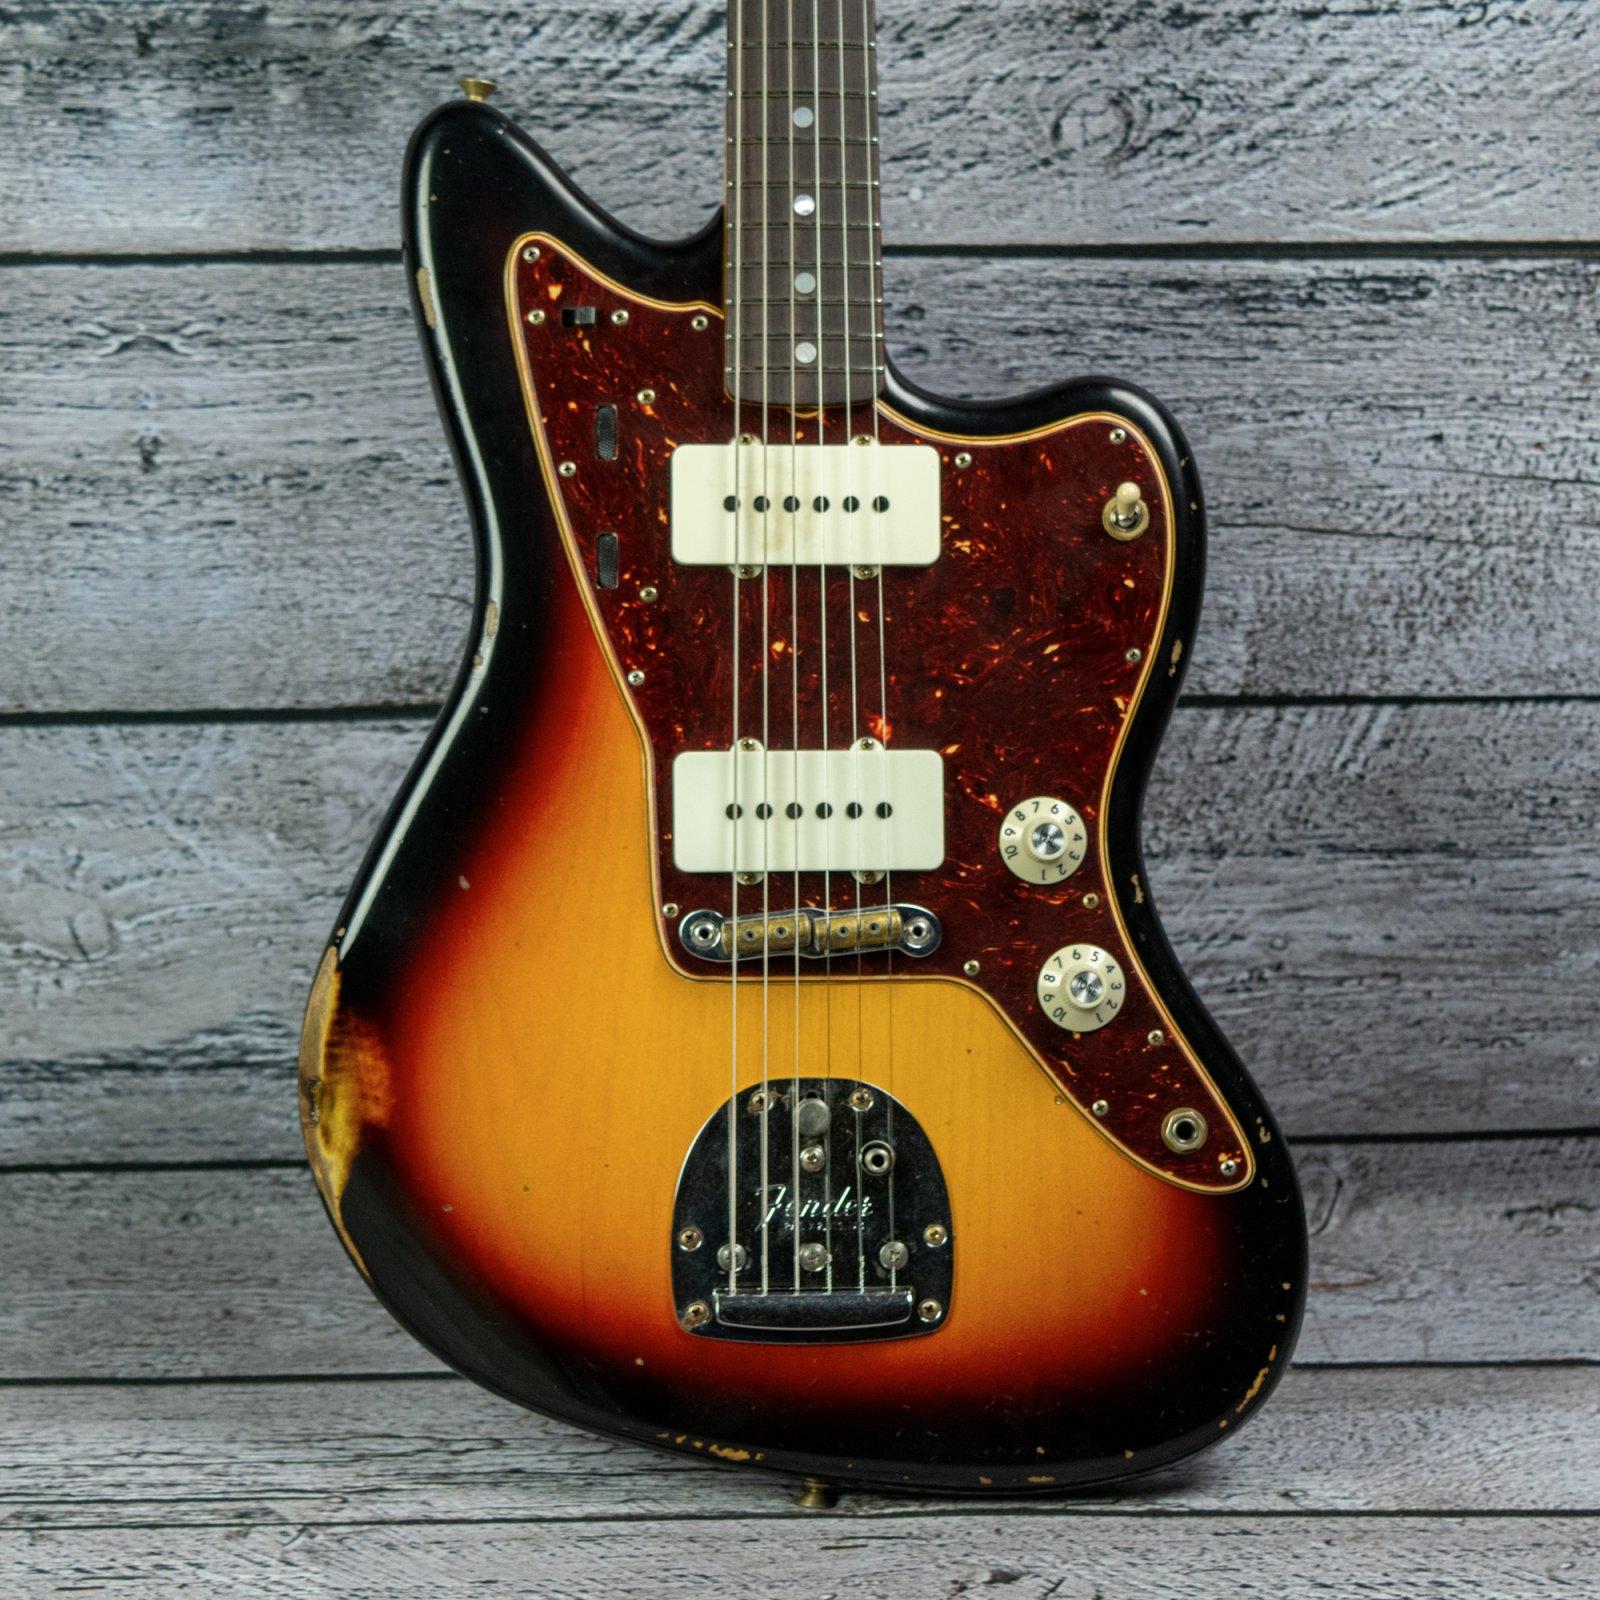 Fender Custom Shop 1965 Jazzmaster Relic - 3-Color Sunburst